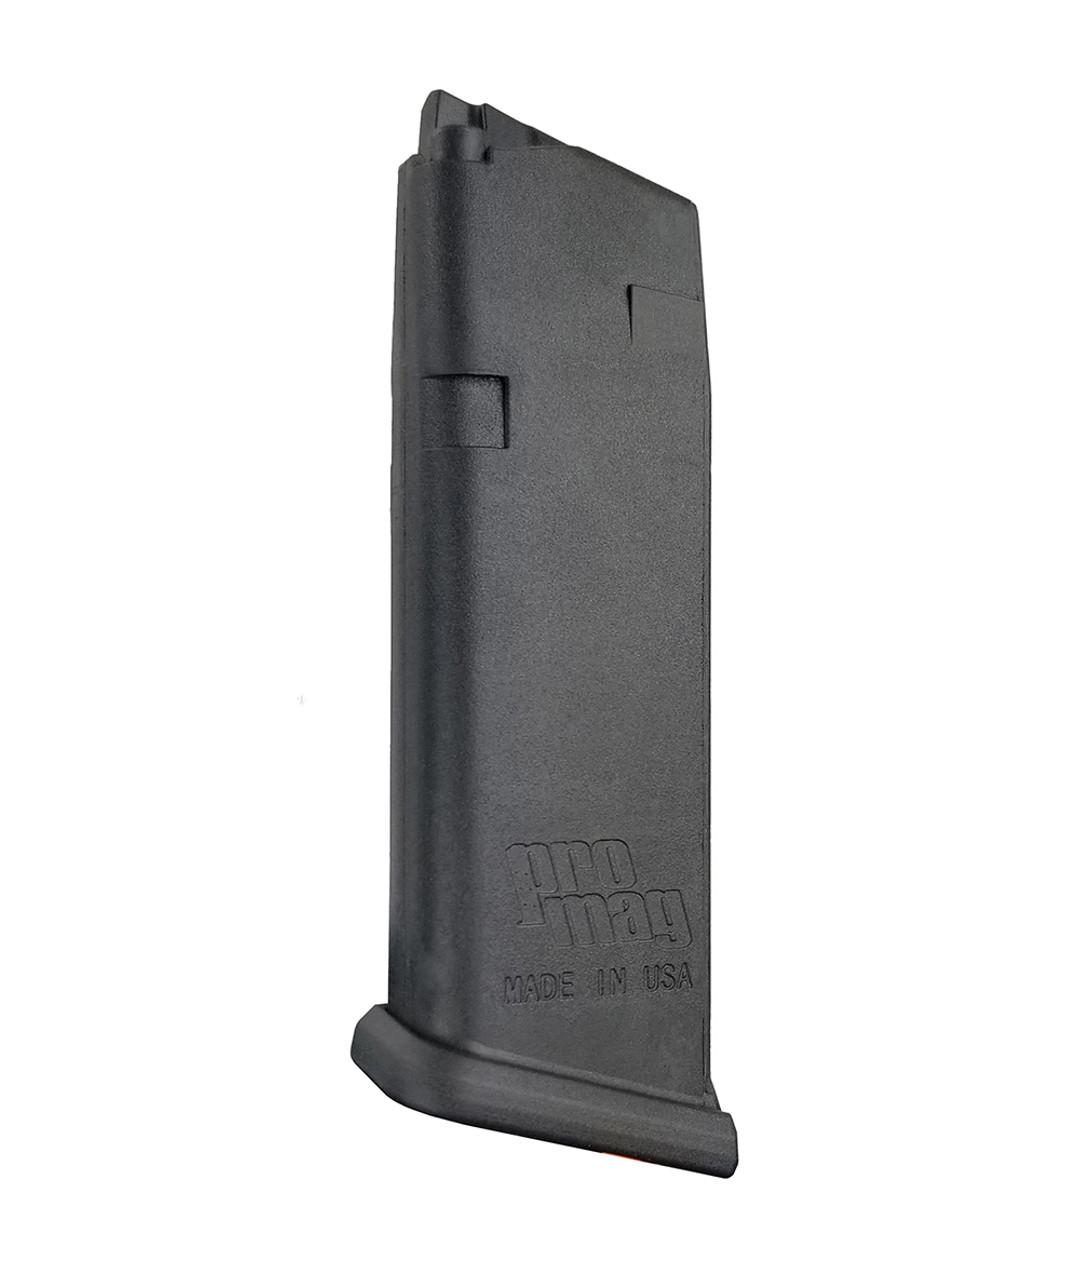 Fits the Glock® Model 21 .45 ACP (13) Rd - Black Polymer